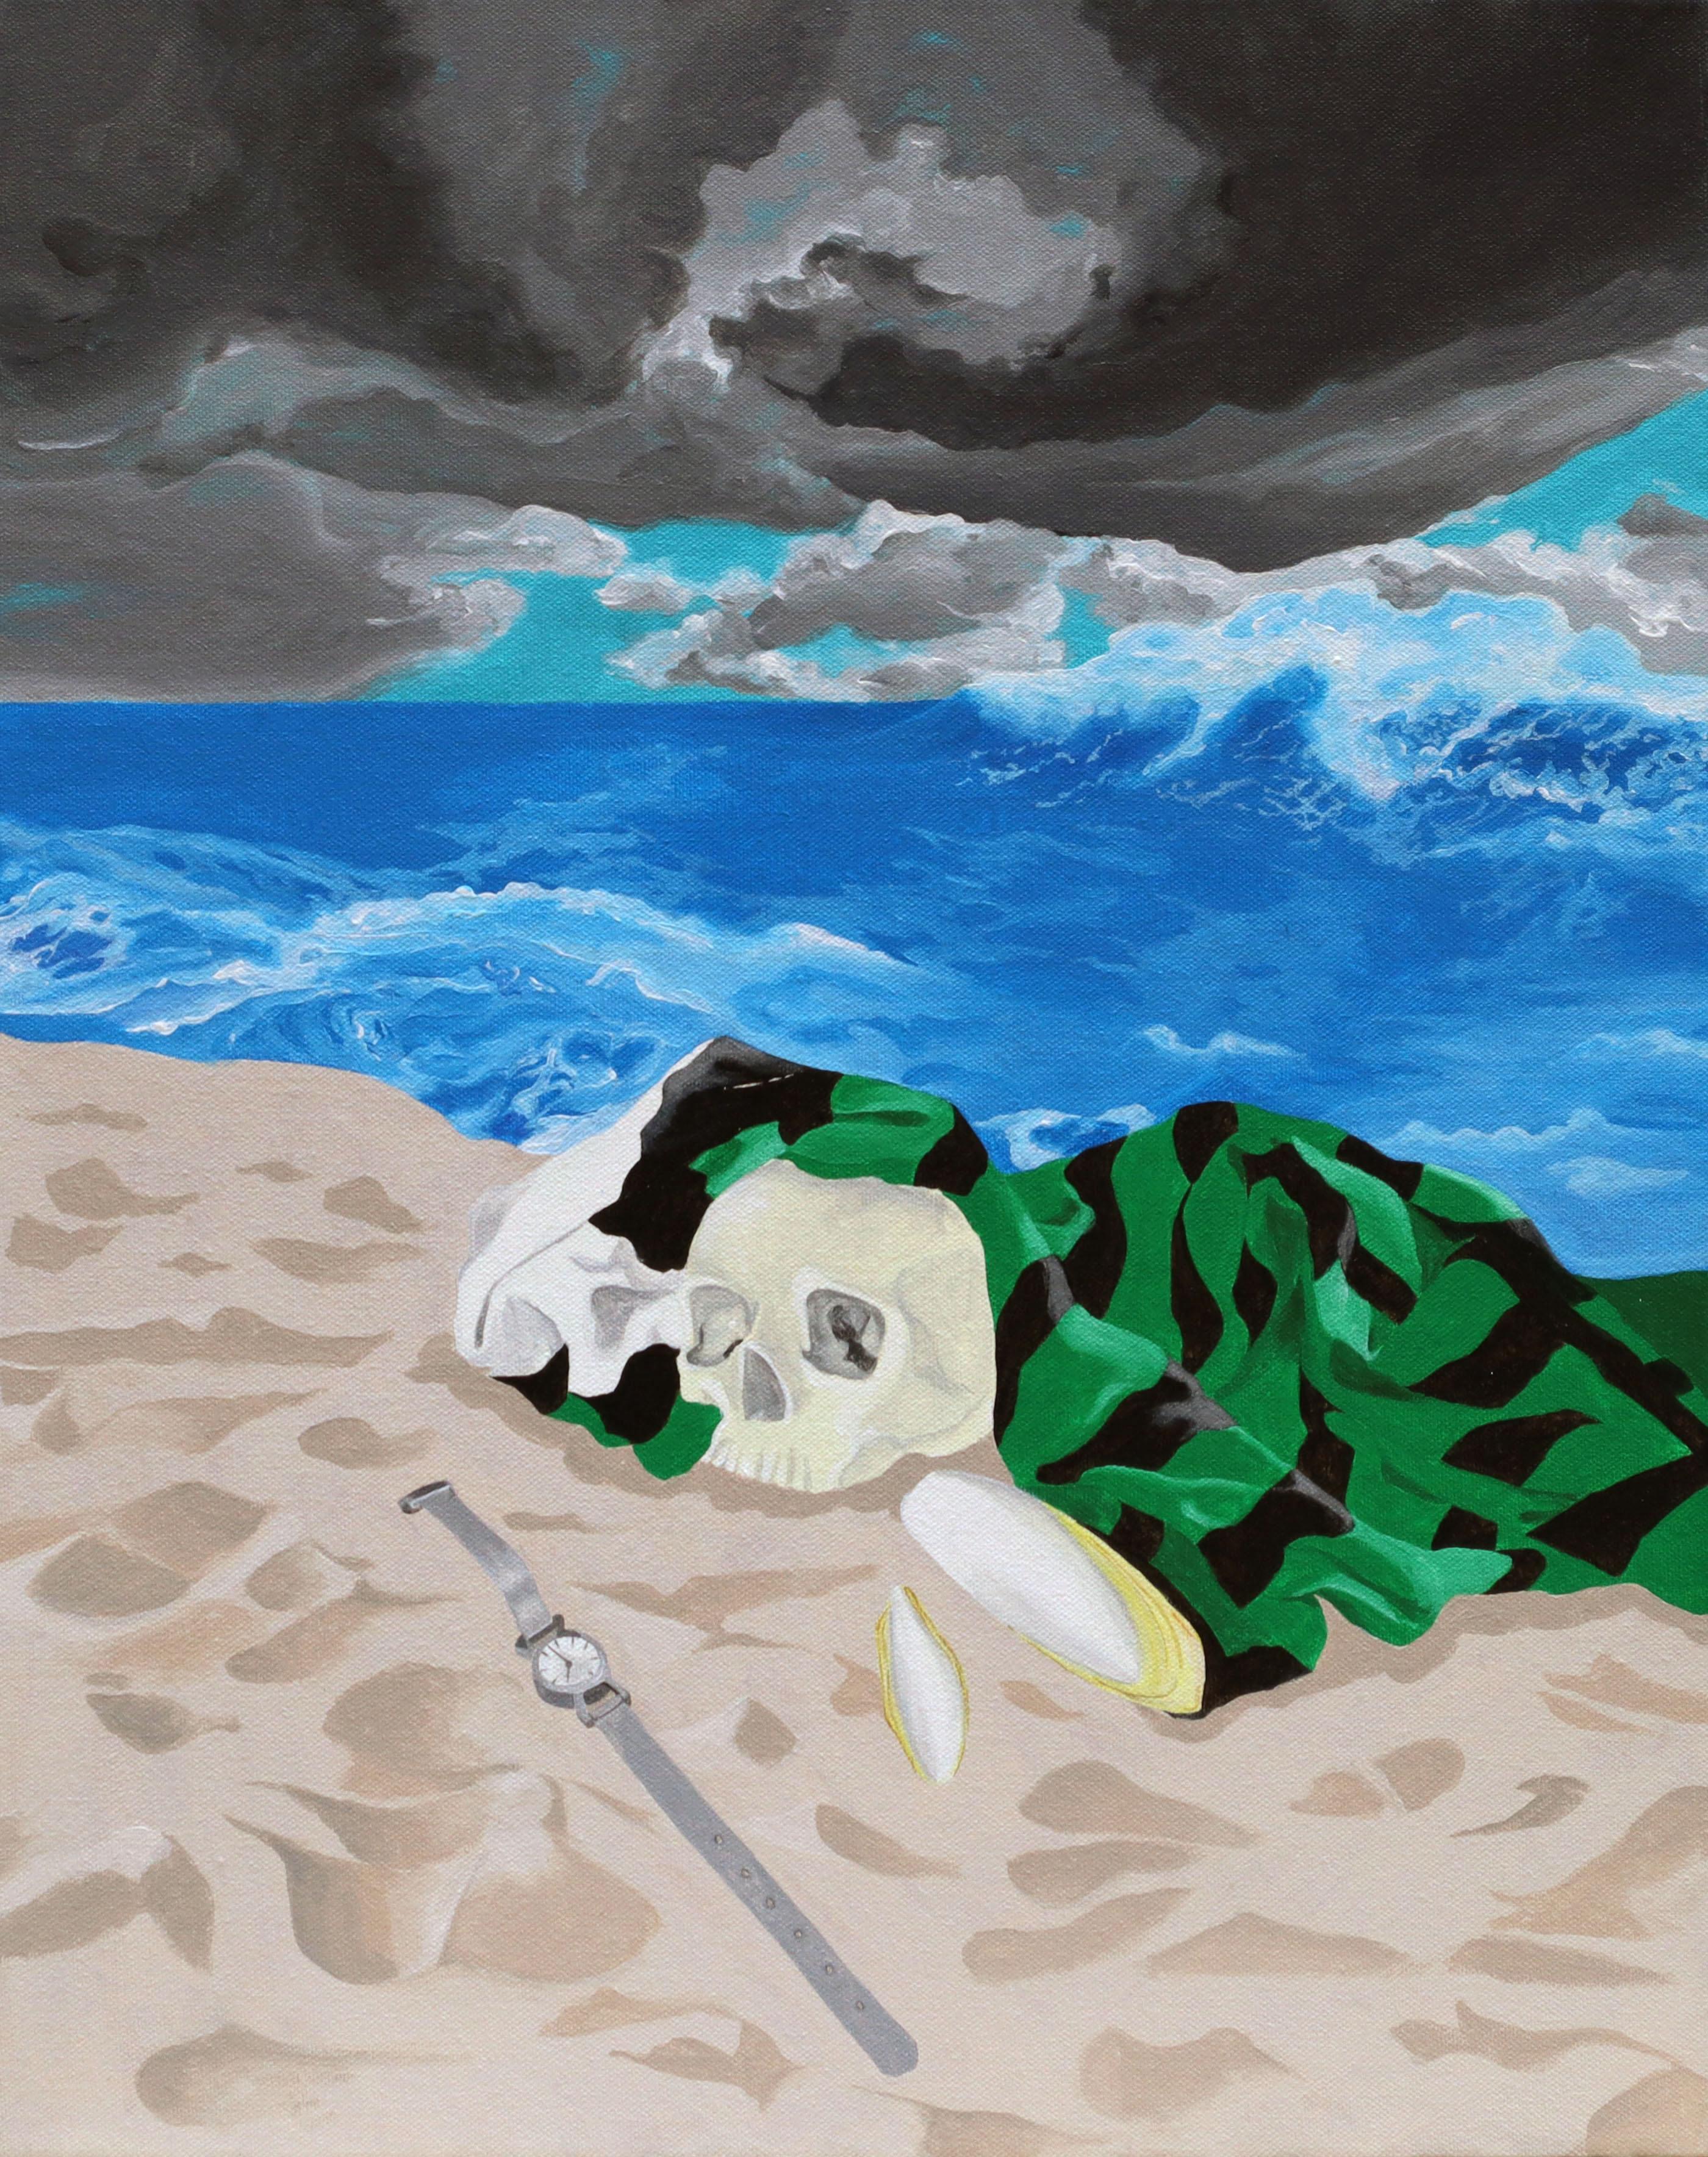 Irene Balia, Eco, 2021, acrilico su tela, 40x50cm